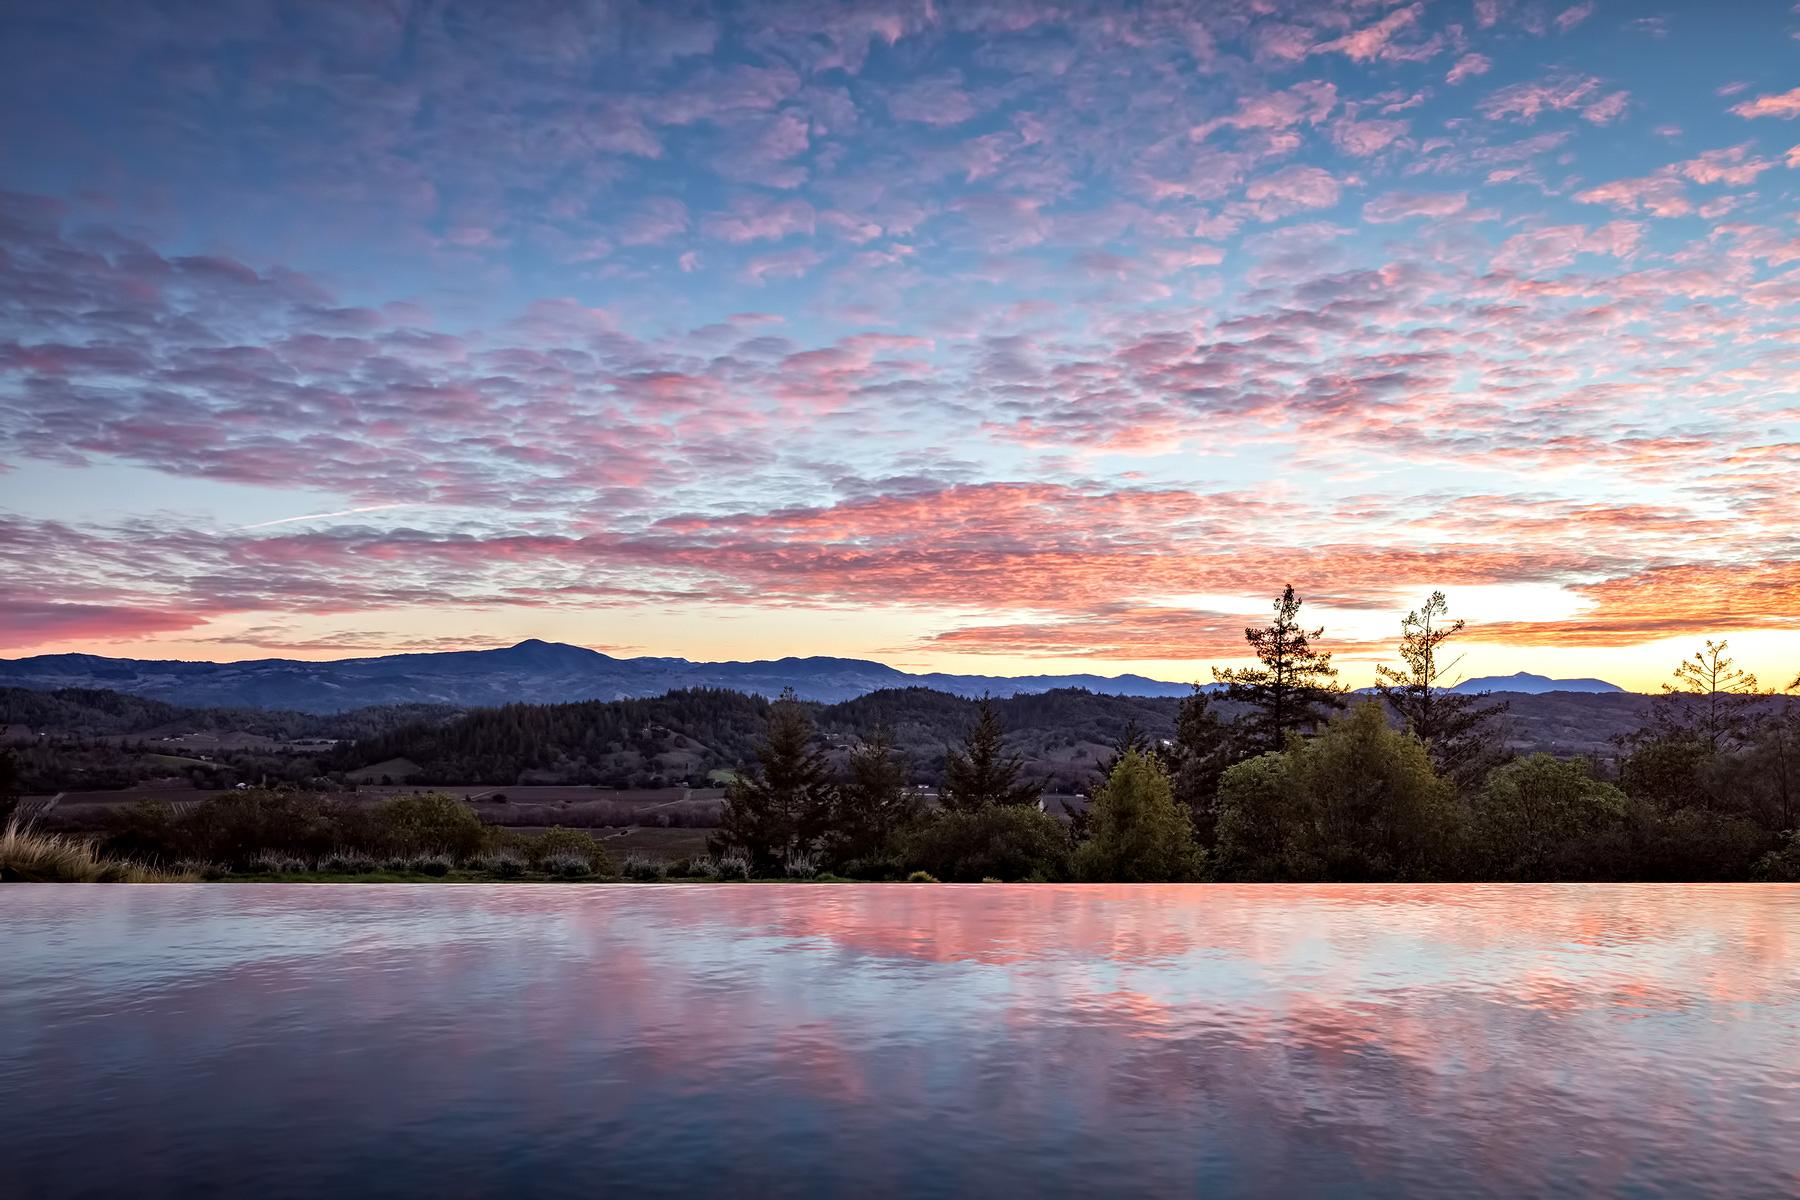 Sonoma Luxury Residence - W Dry Creek Rd, Healdsburg, CA, USA